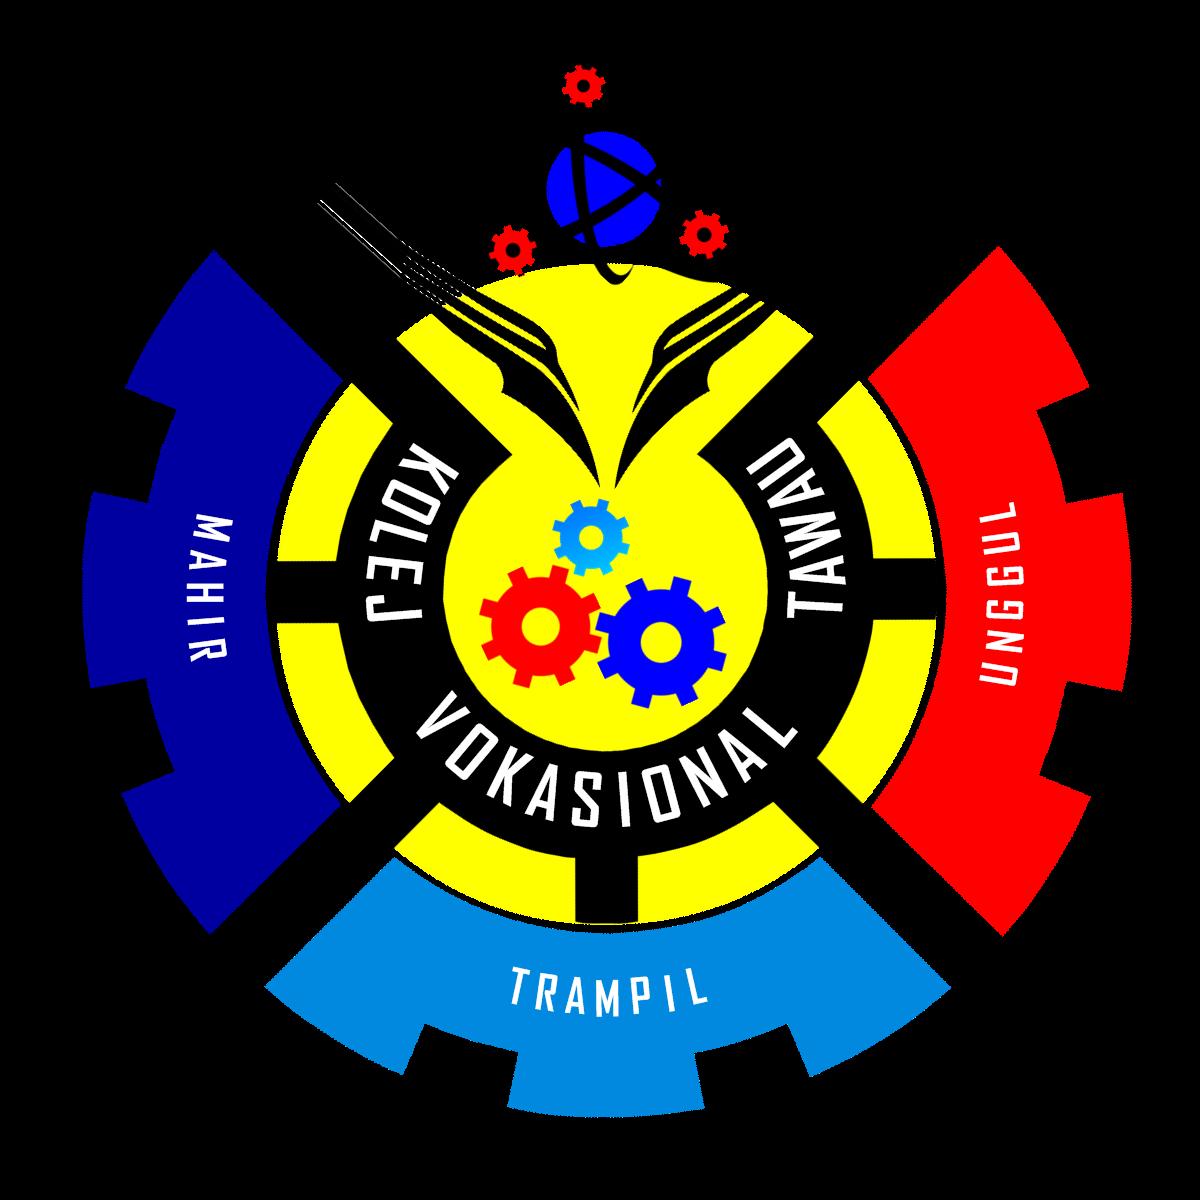 logo moto dan slogan kolej vokasional tawau